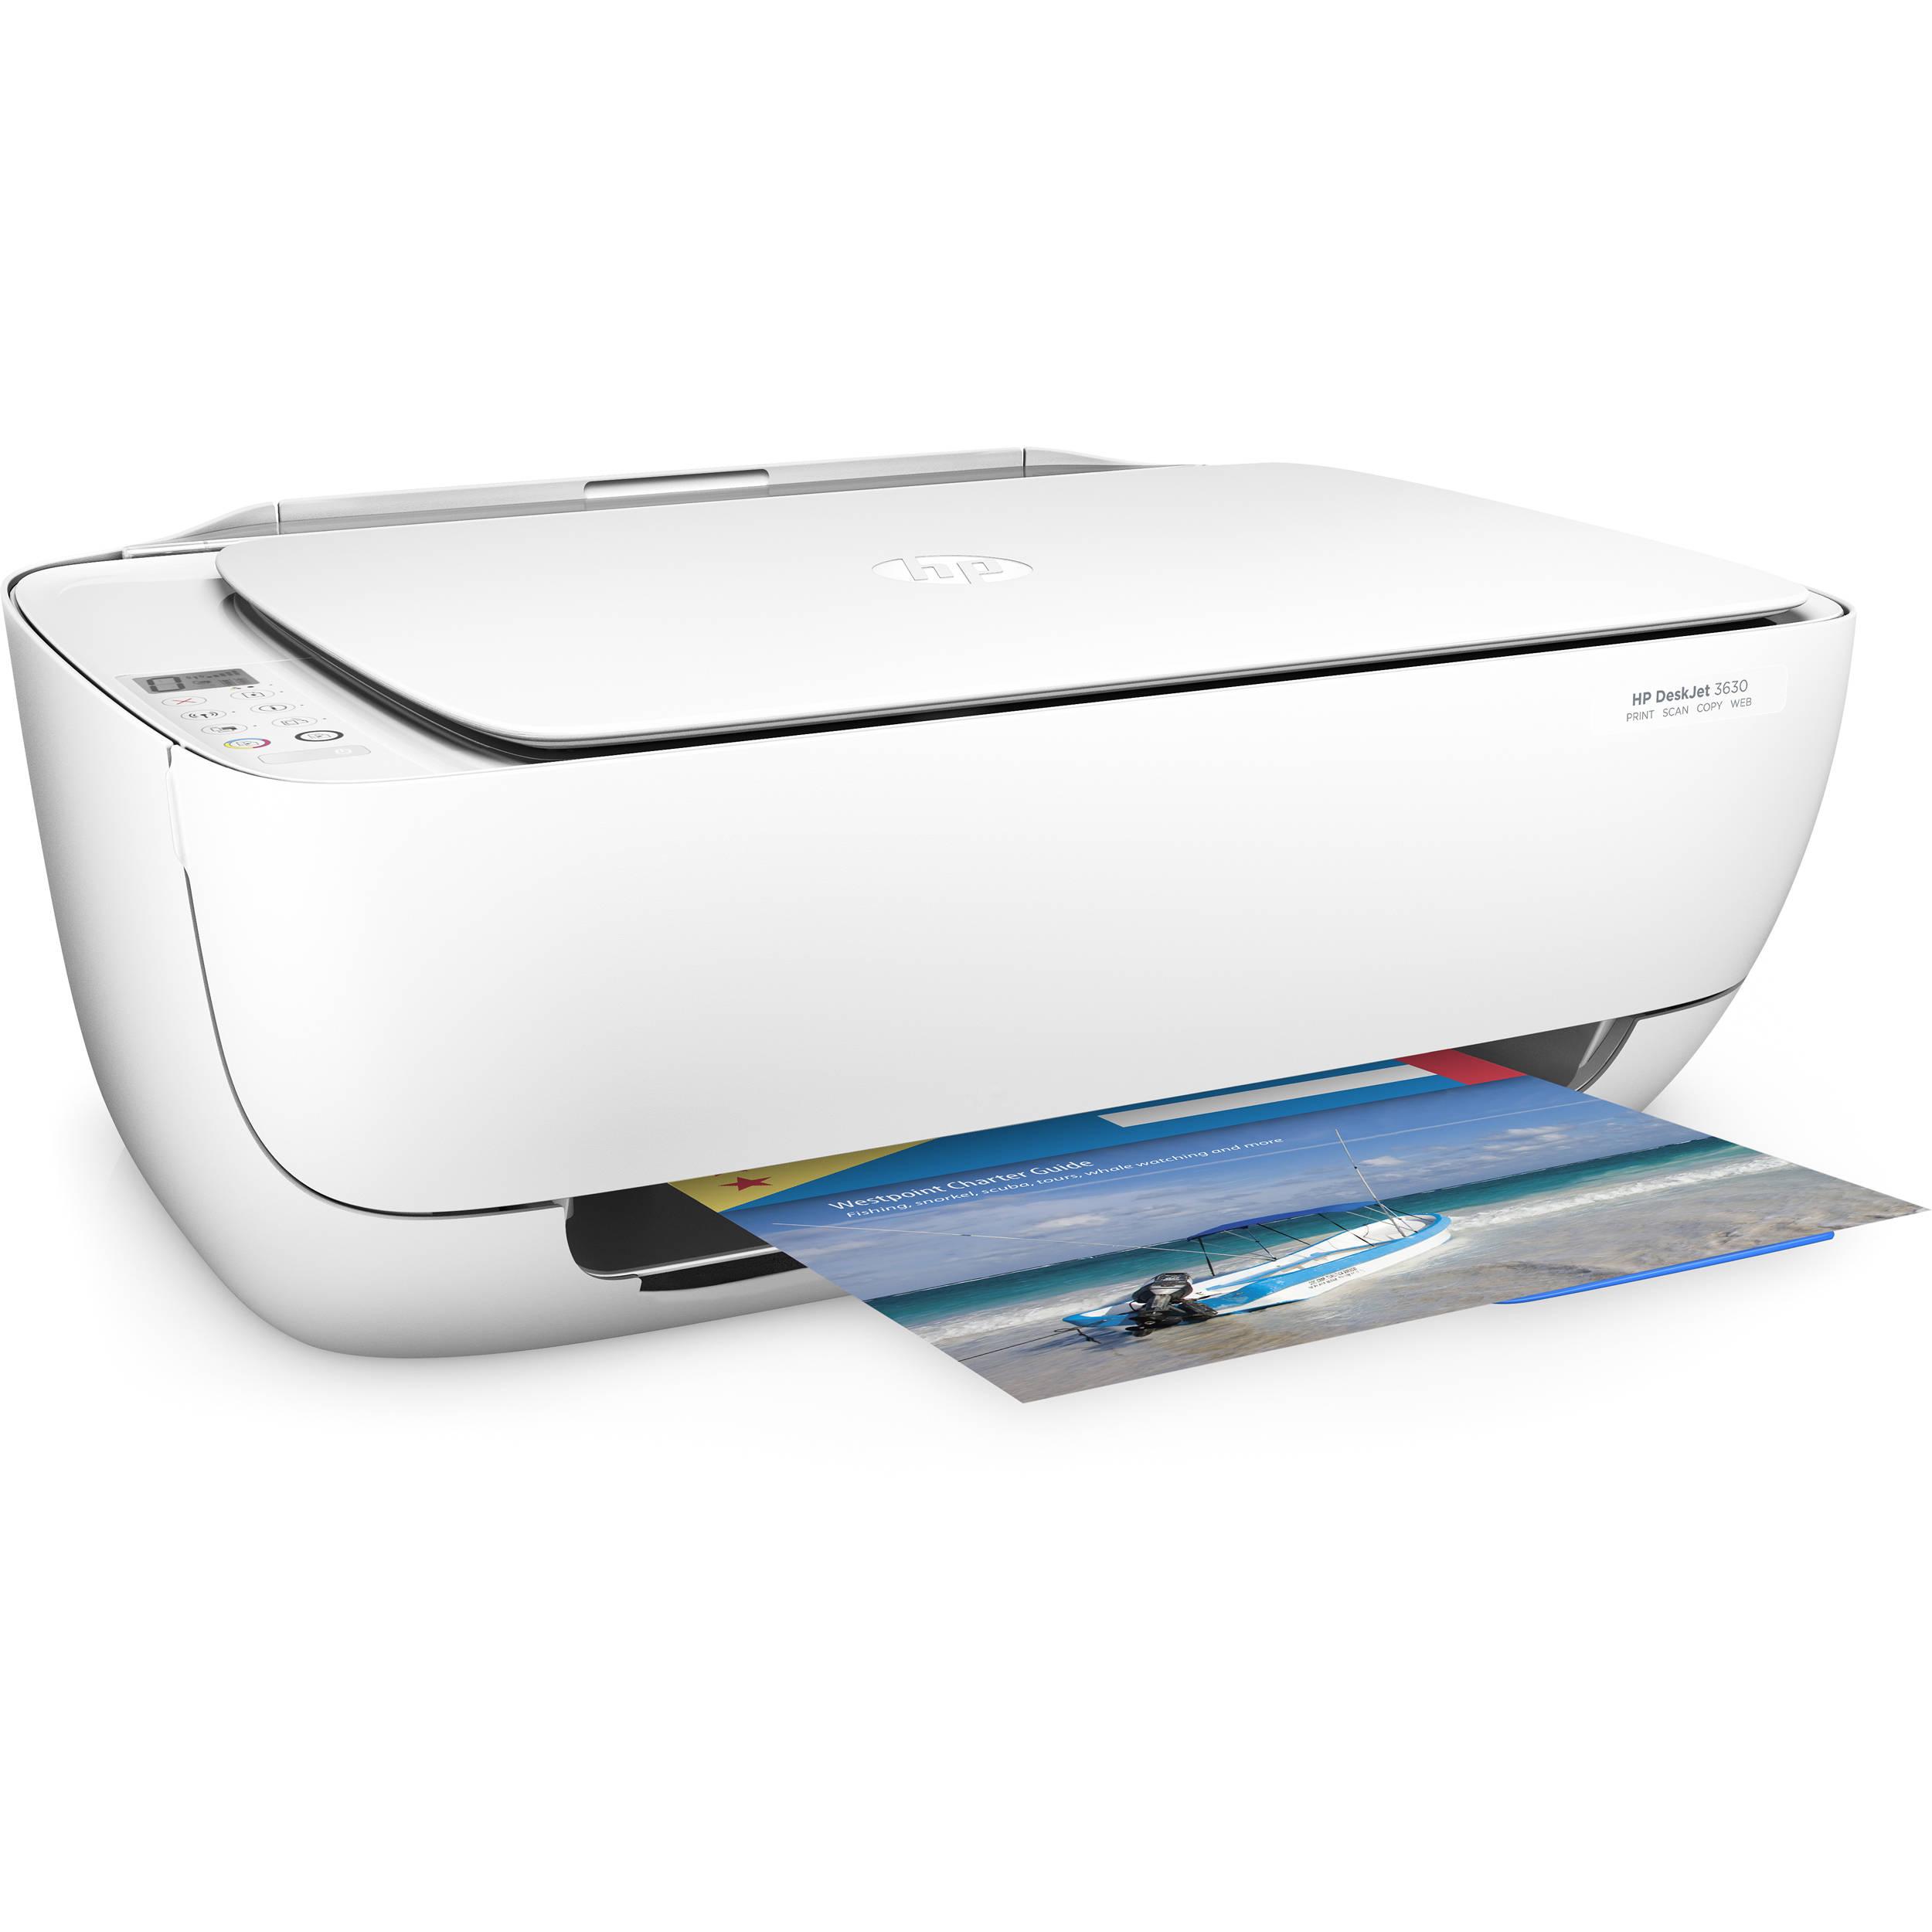 HP DeskJet 3630 All-in-One Inkjet Printer